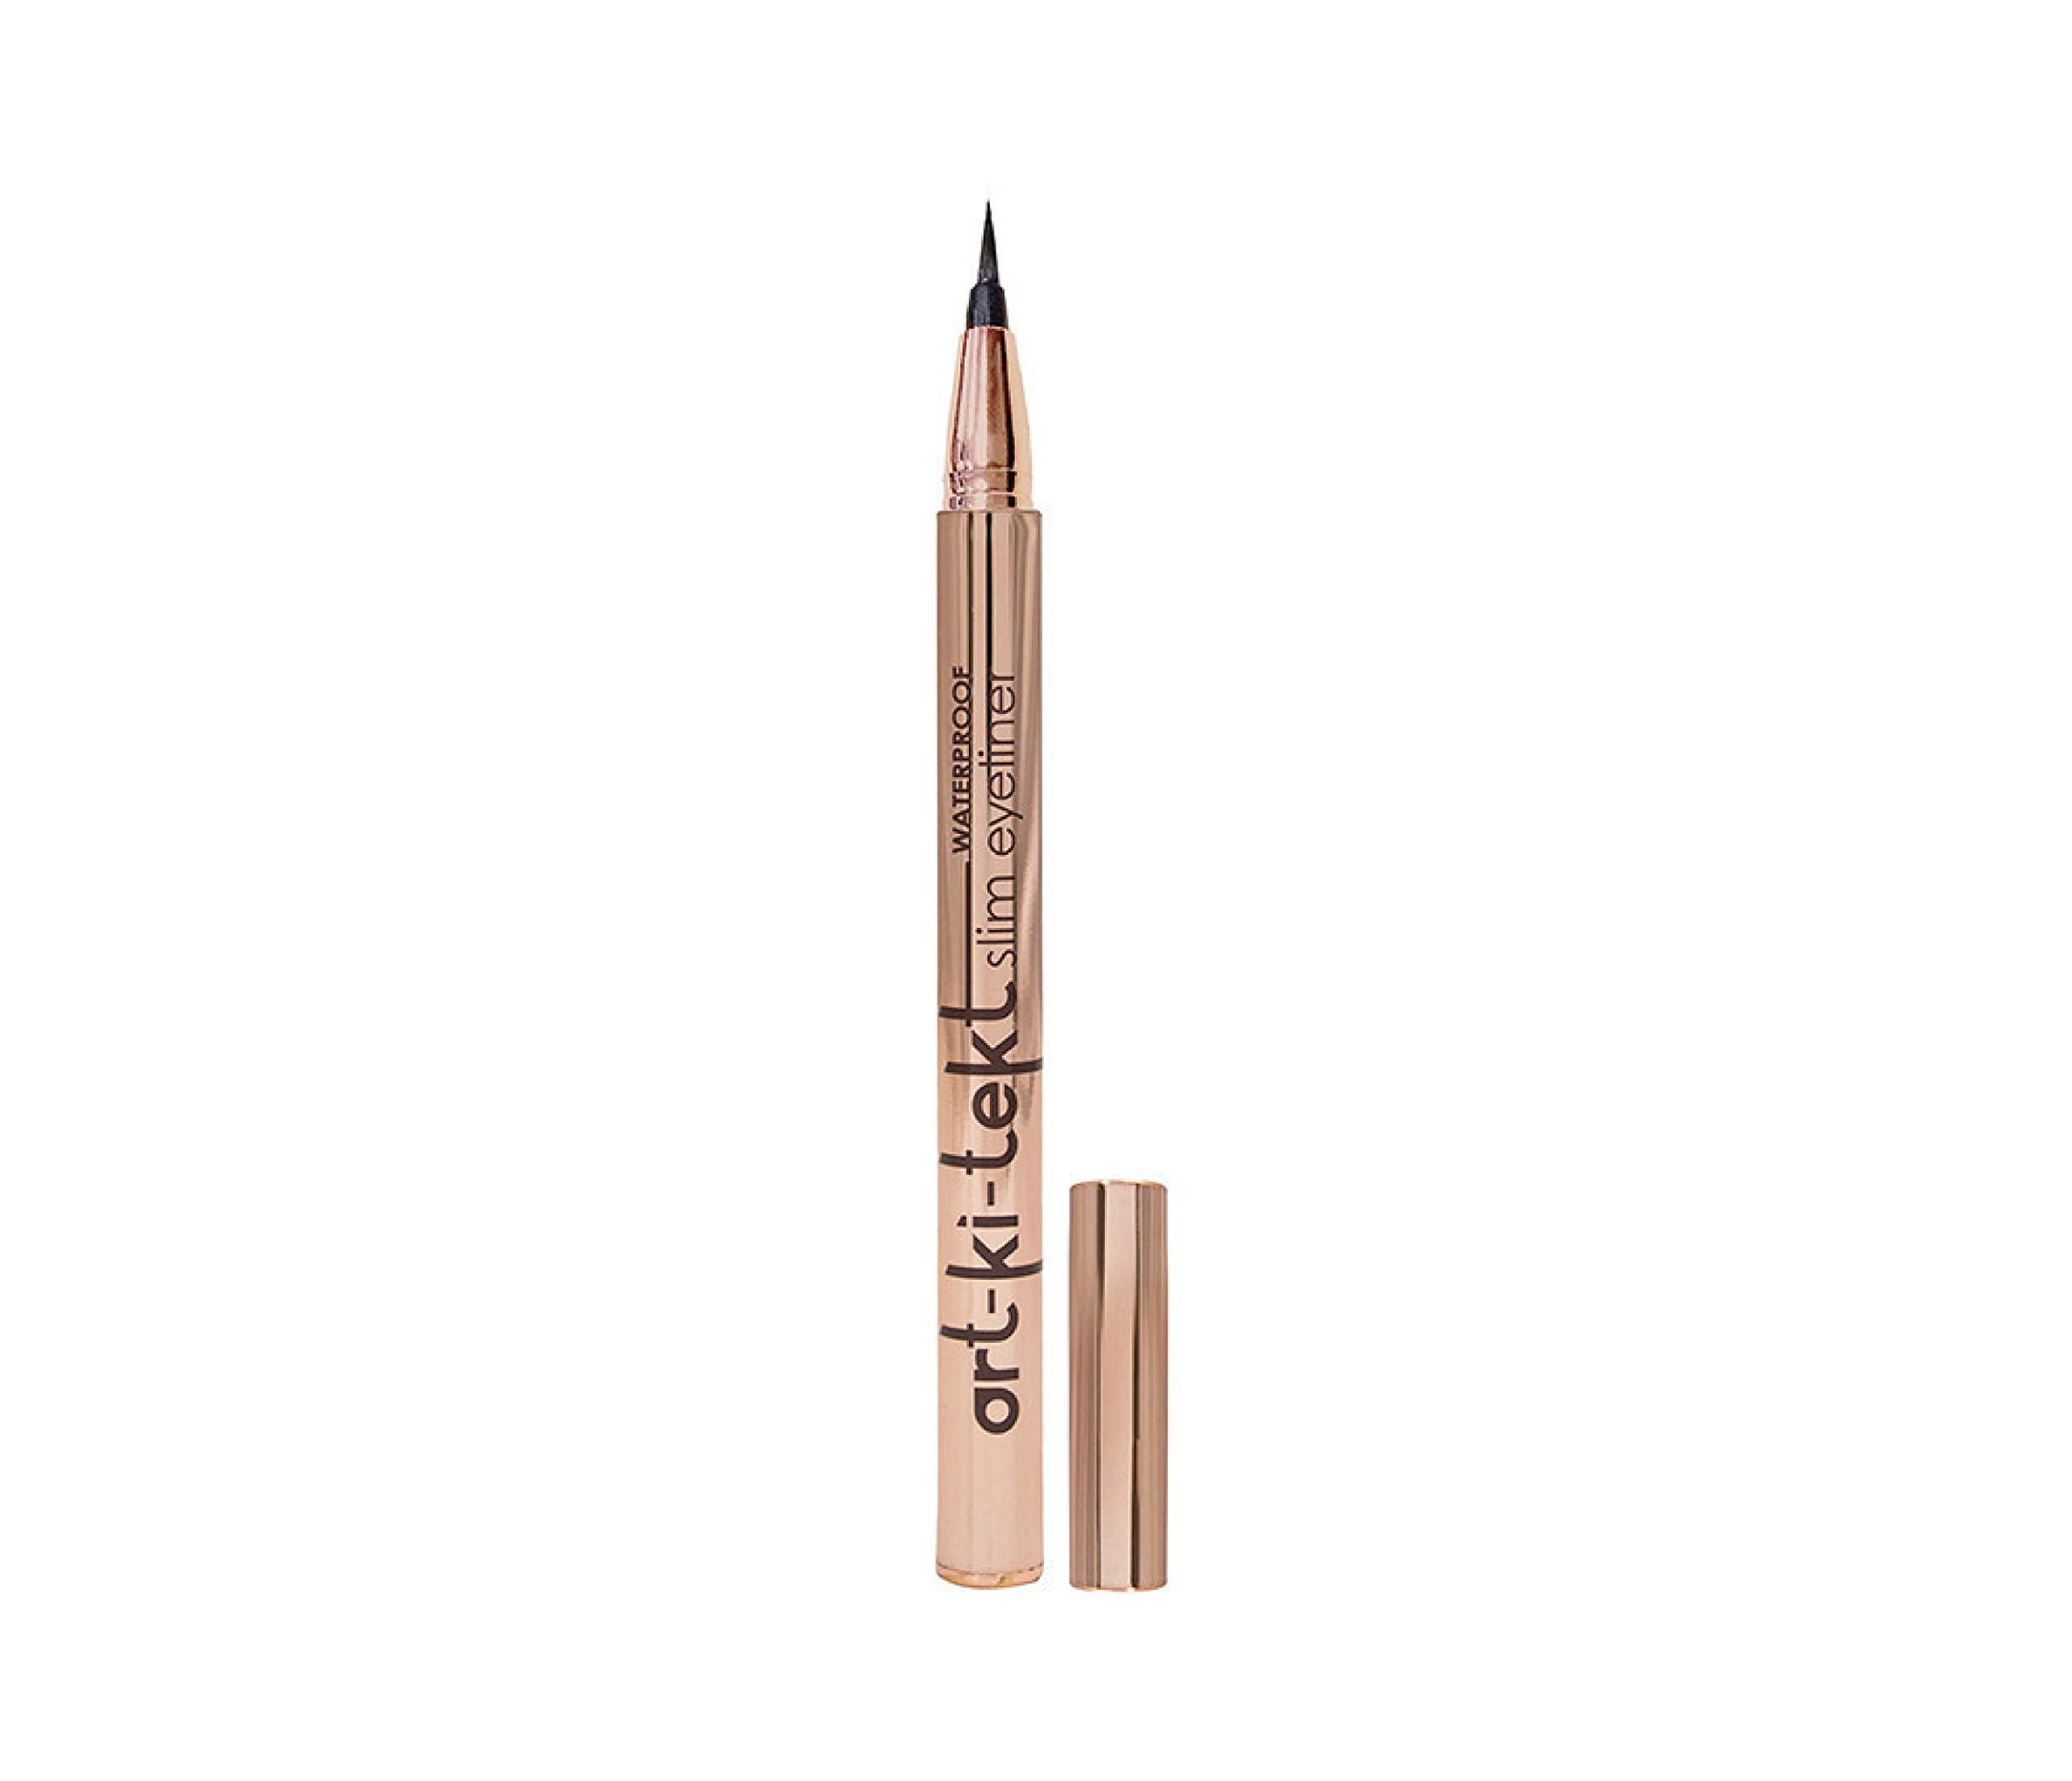 LA Splash Cosmetics Art-Ki-tekt Waterproof&Long-Lasting Slim Black Liquid Eyeliner for Beginners